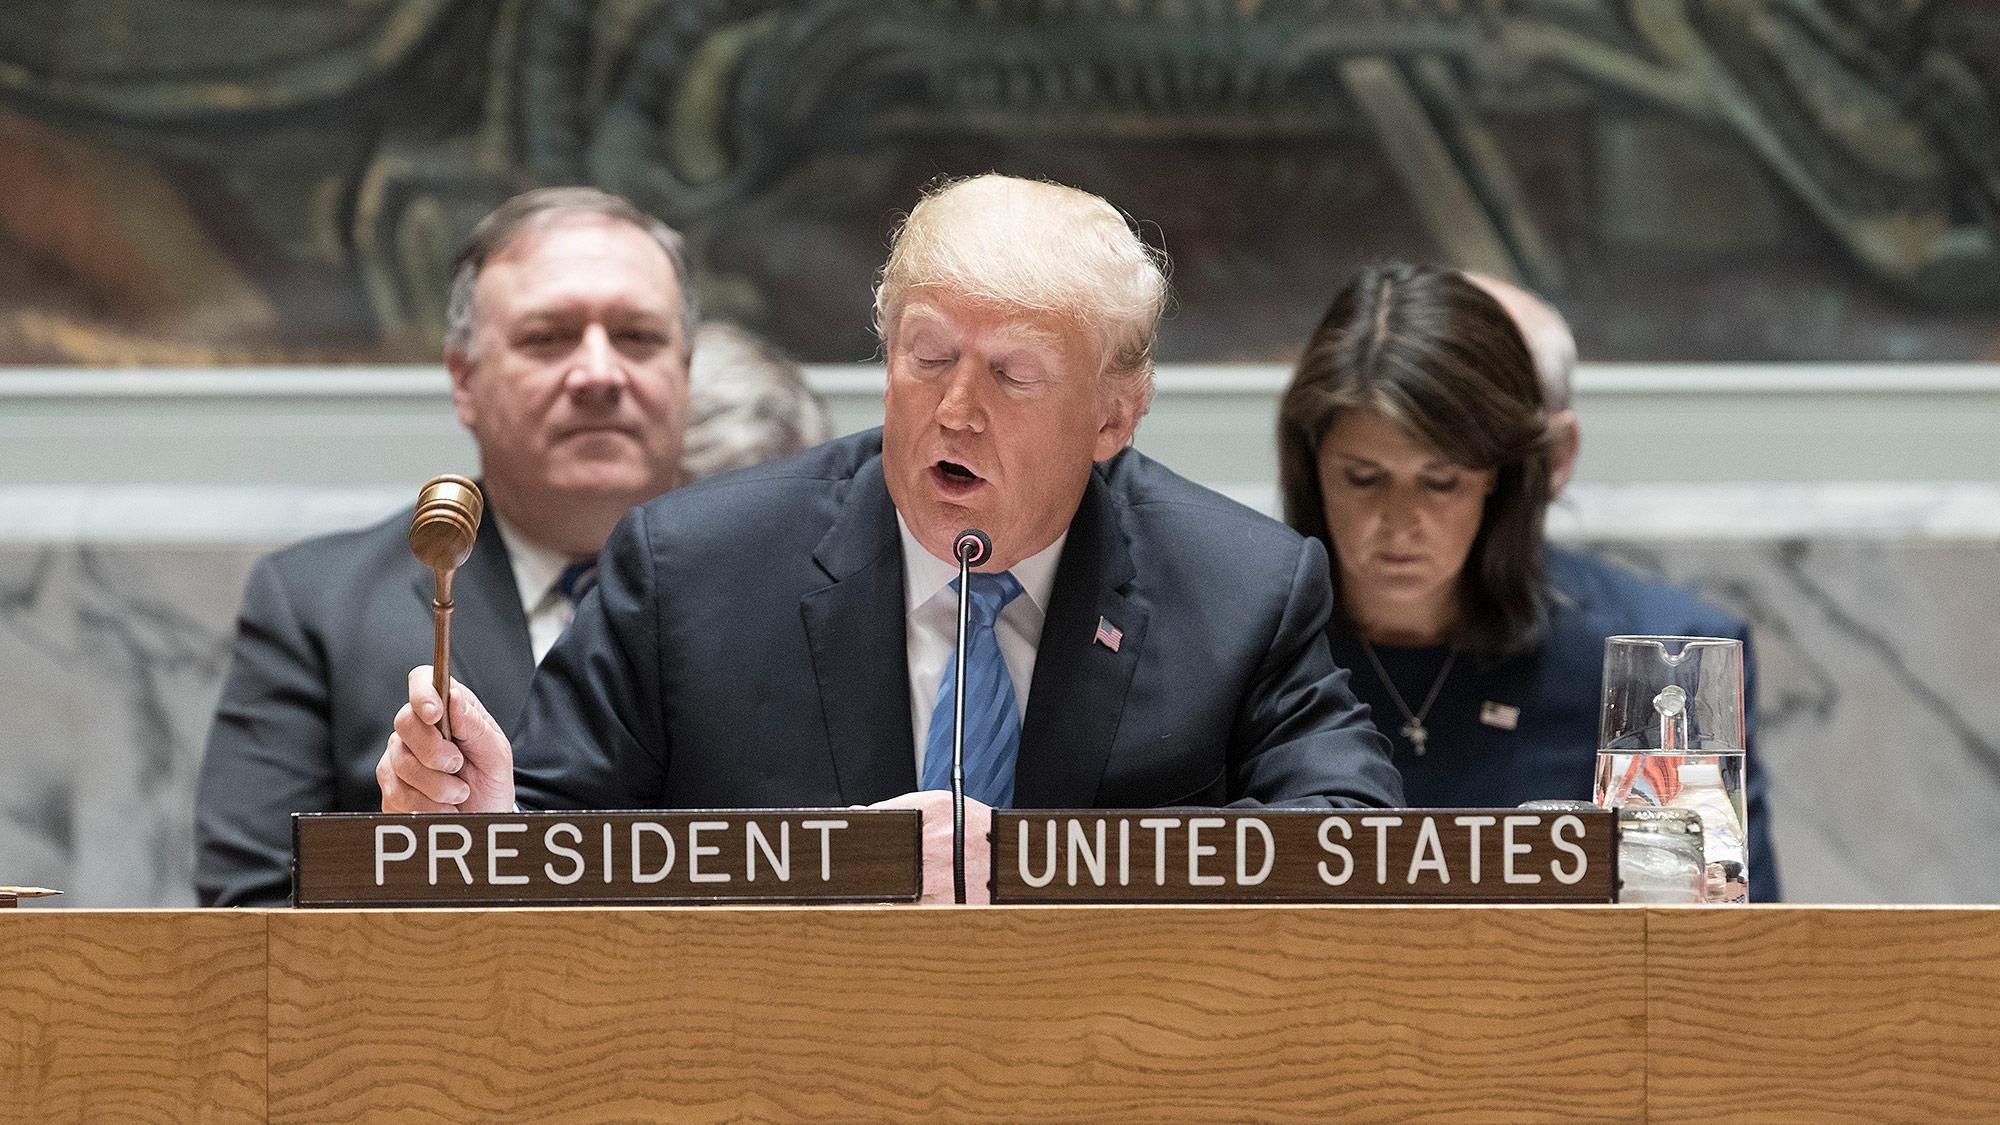 Gobierno de Trump califica de 'absurdo' fallo sobre asilo a migrantes